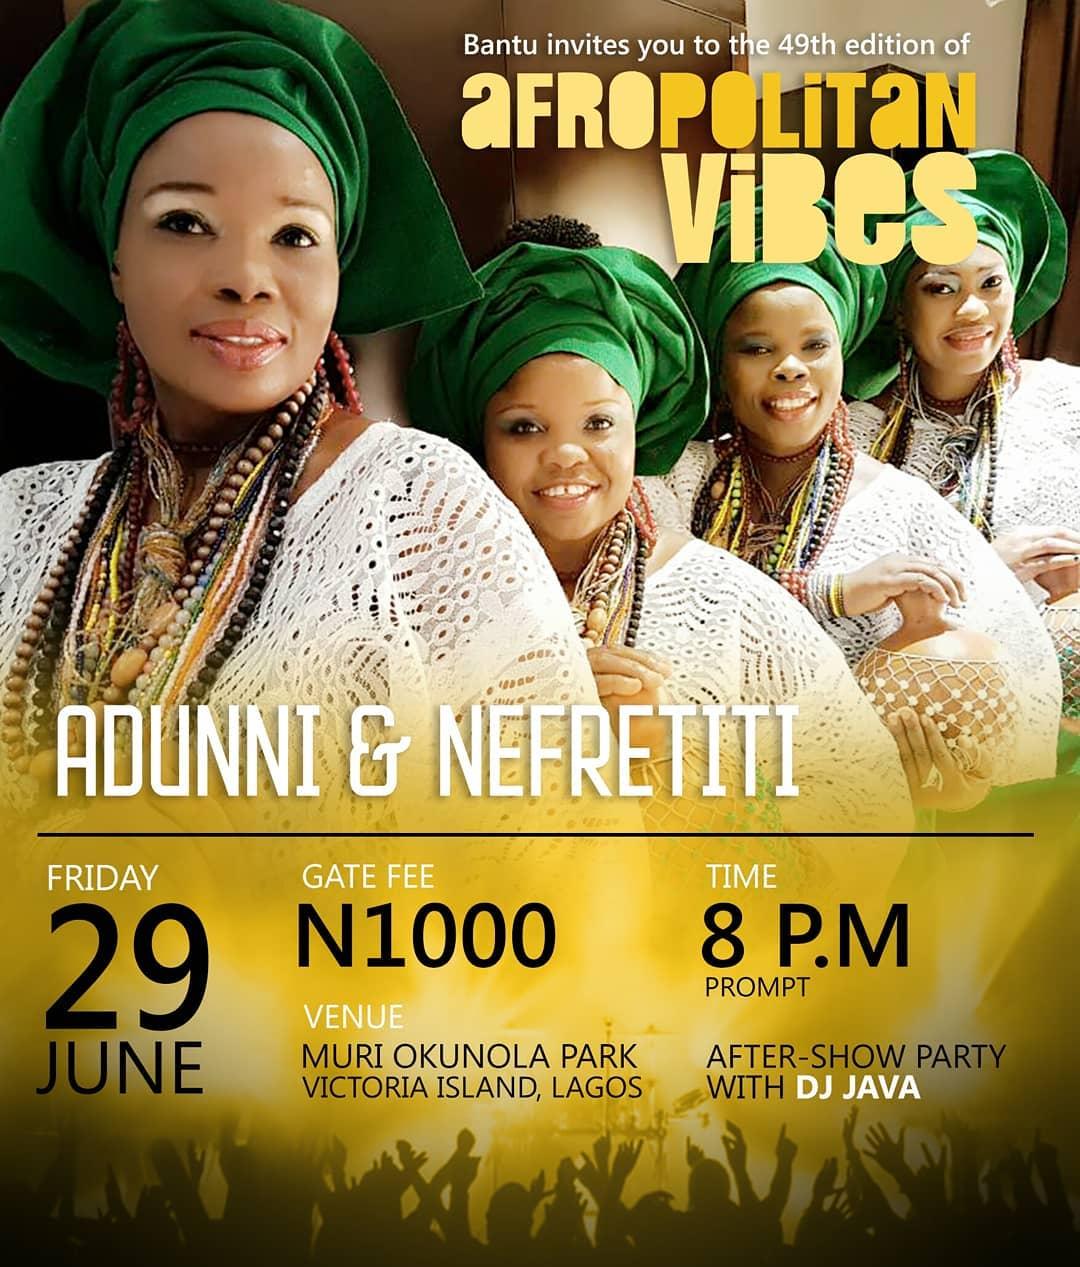 29 june 2018; afropolitan vibes 49th edition; lagos, nigeria; globetrotter magazine.jpg